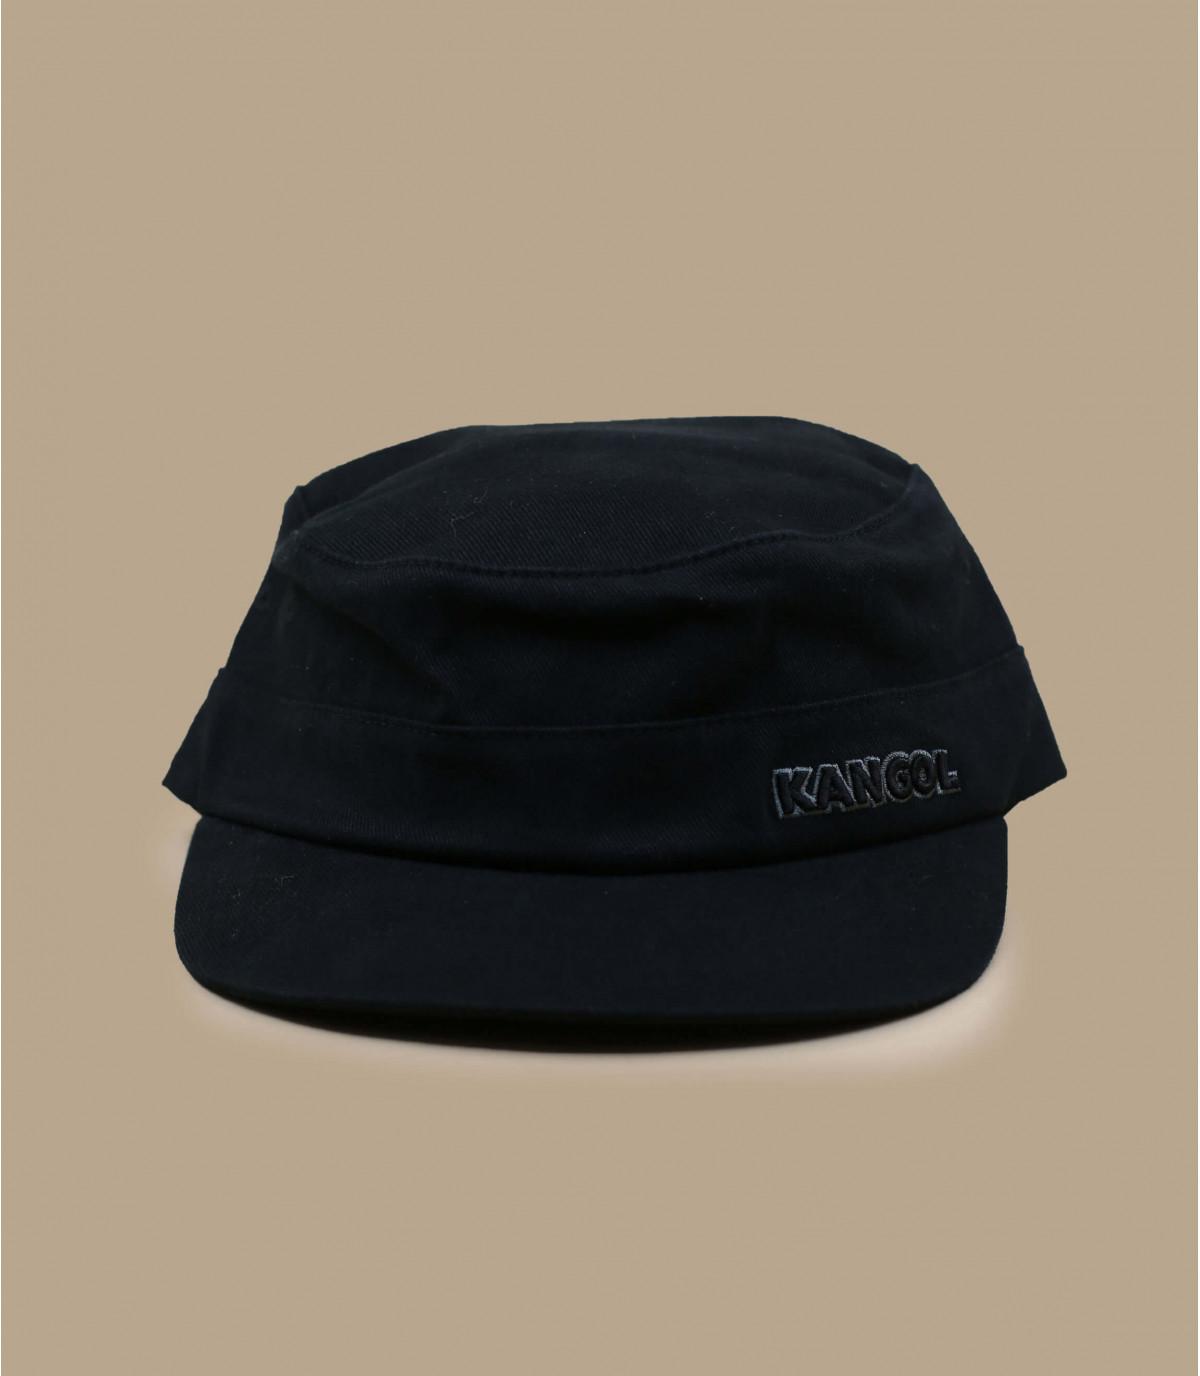 Kangol black army cap